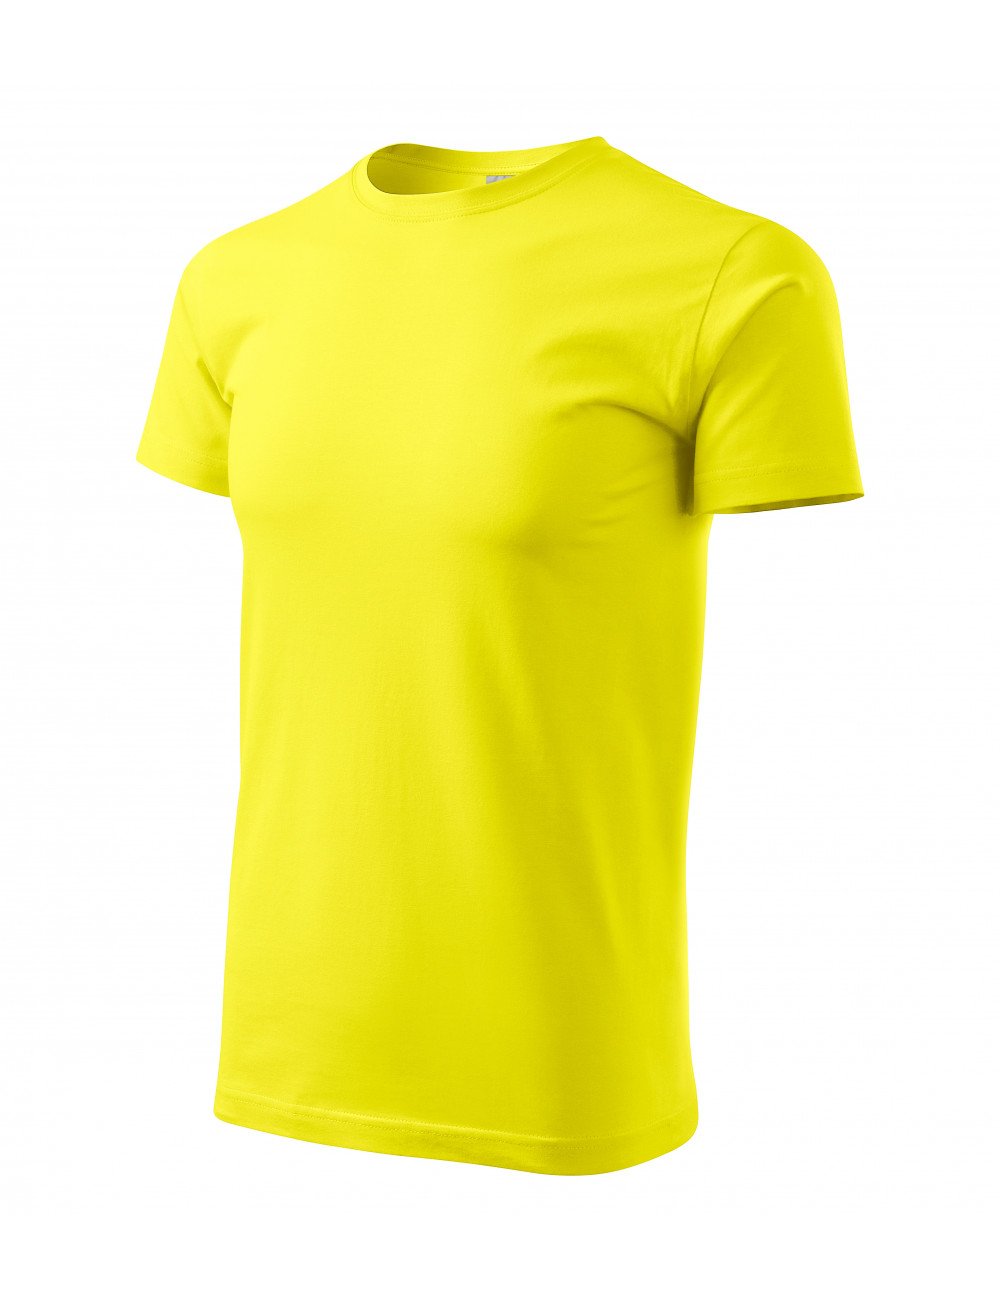 Adler MALFINI Koszulka unisex Heavy New 137 cytrynowy